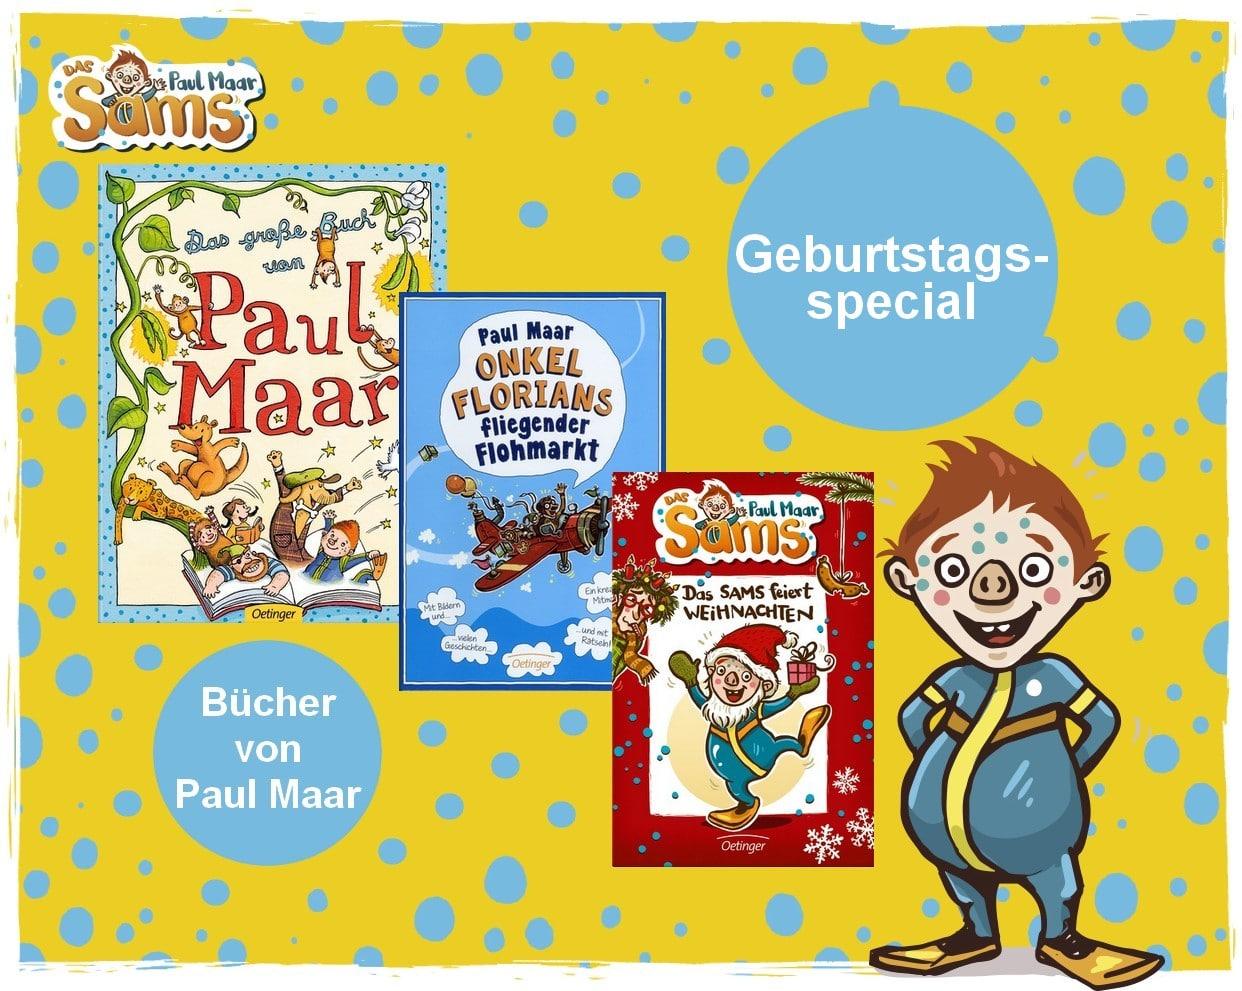 Samsiges Geburtstagsspecial – Paul Maar wird 80